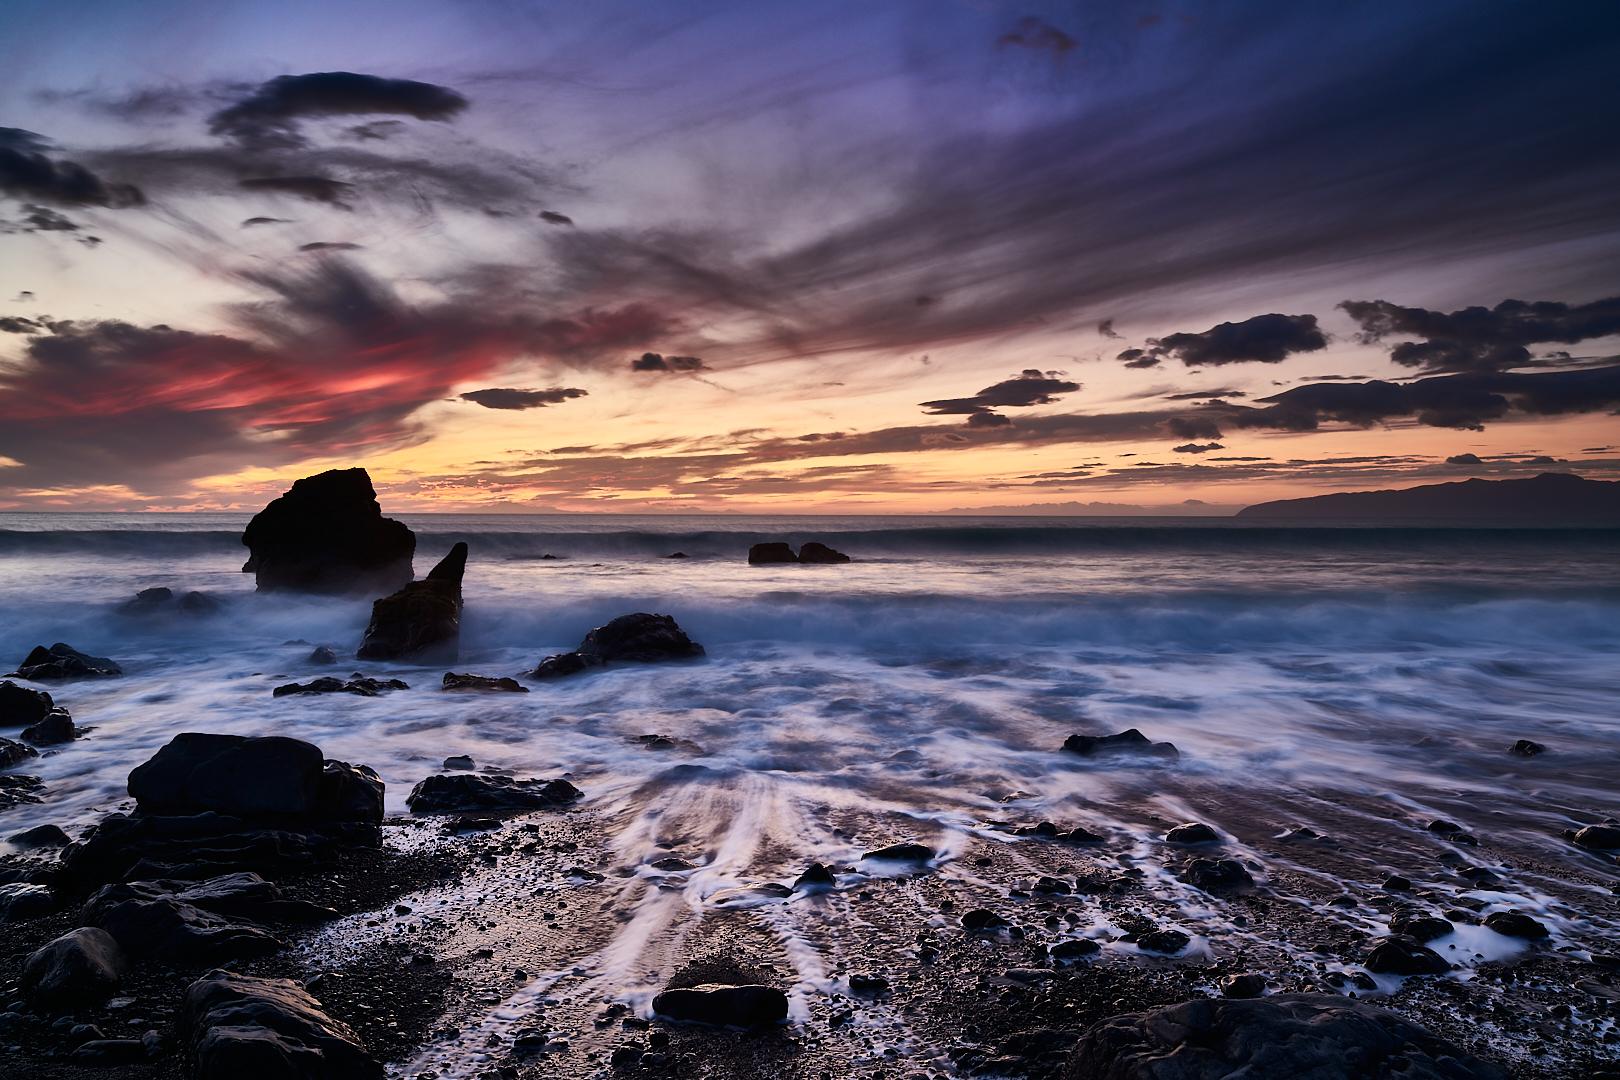 Palliser Bay, Cook Strait, New Zealand